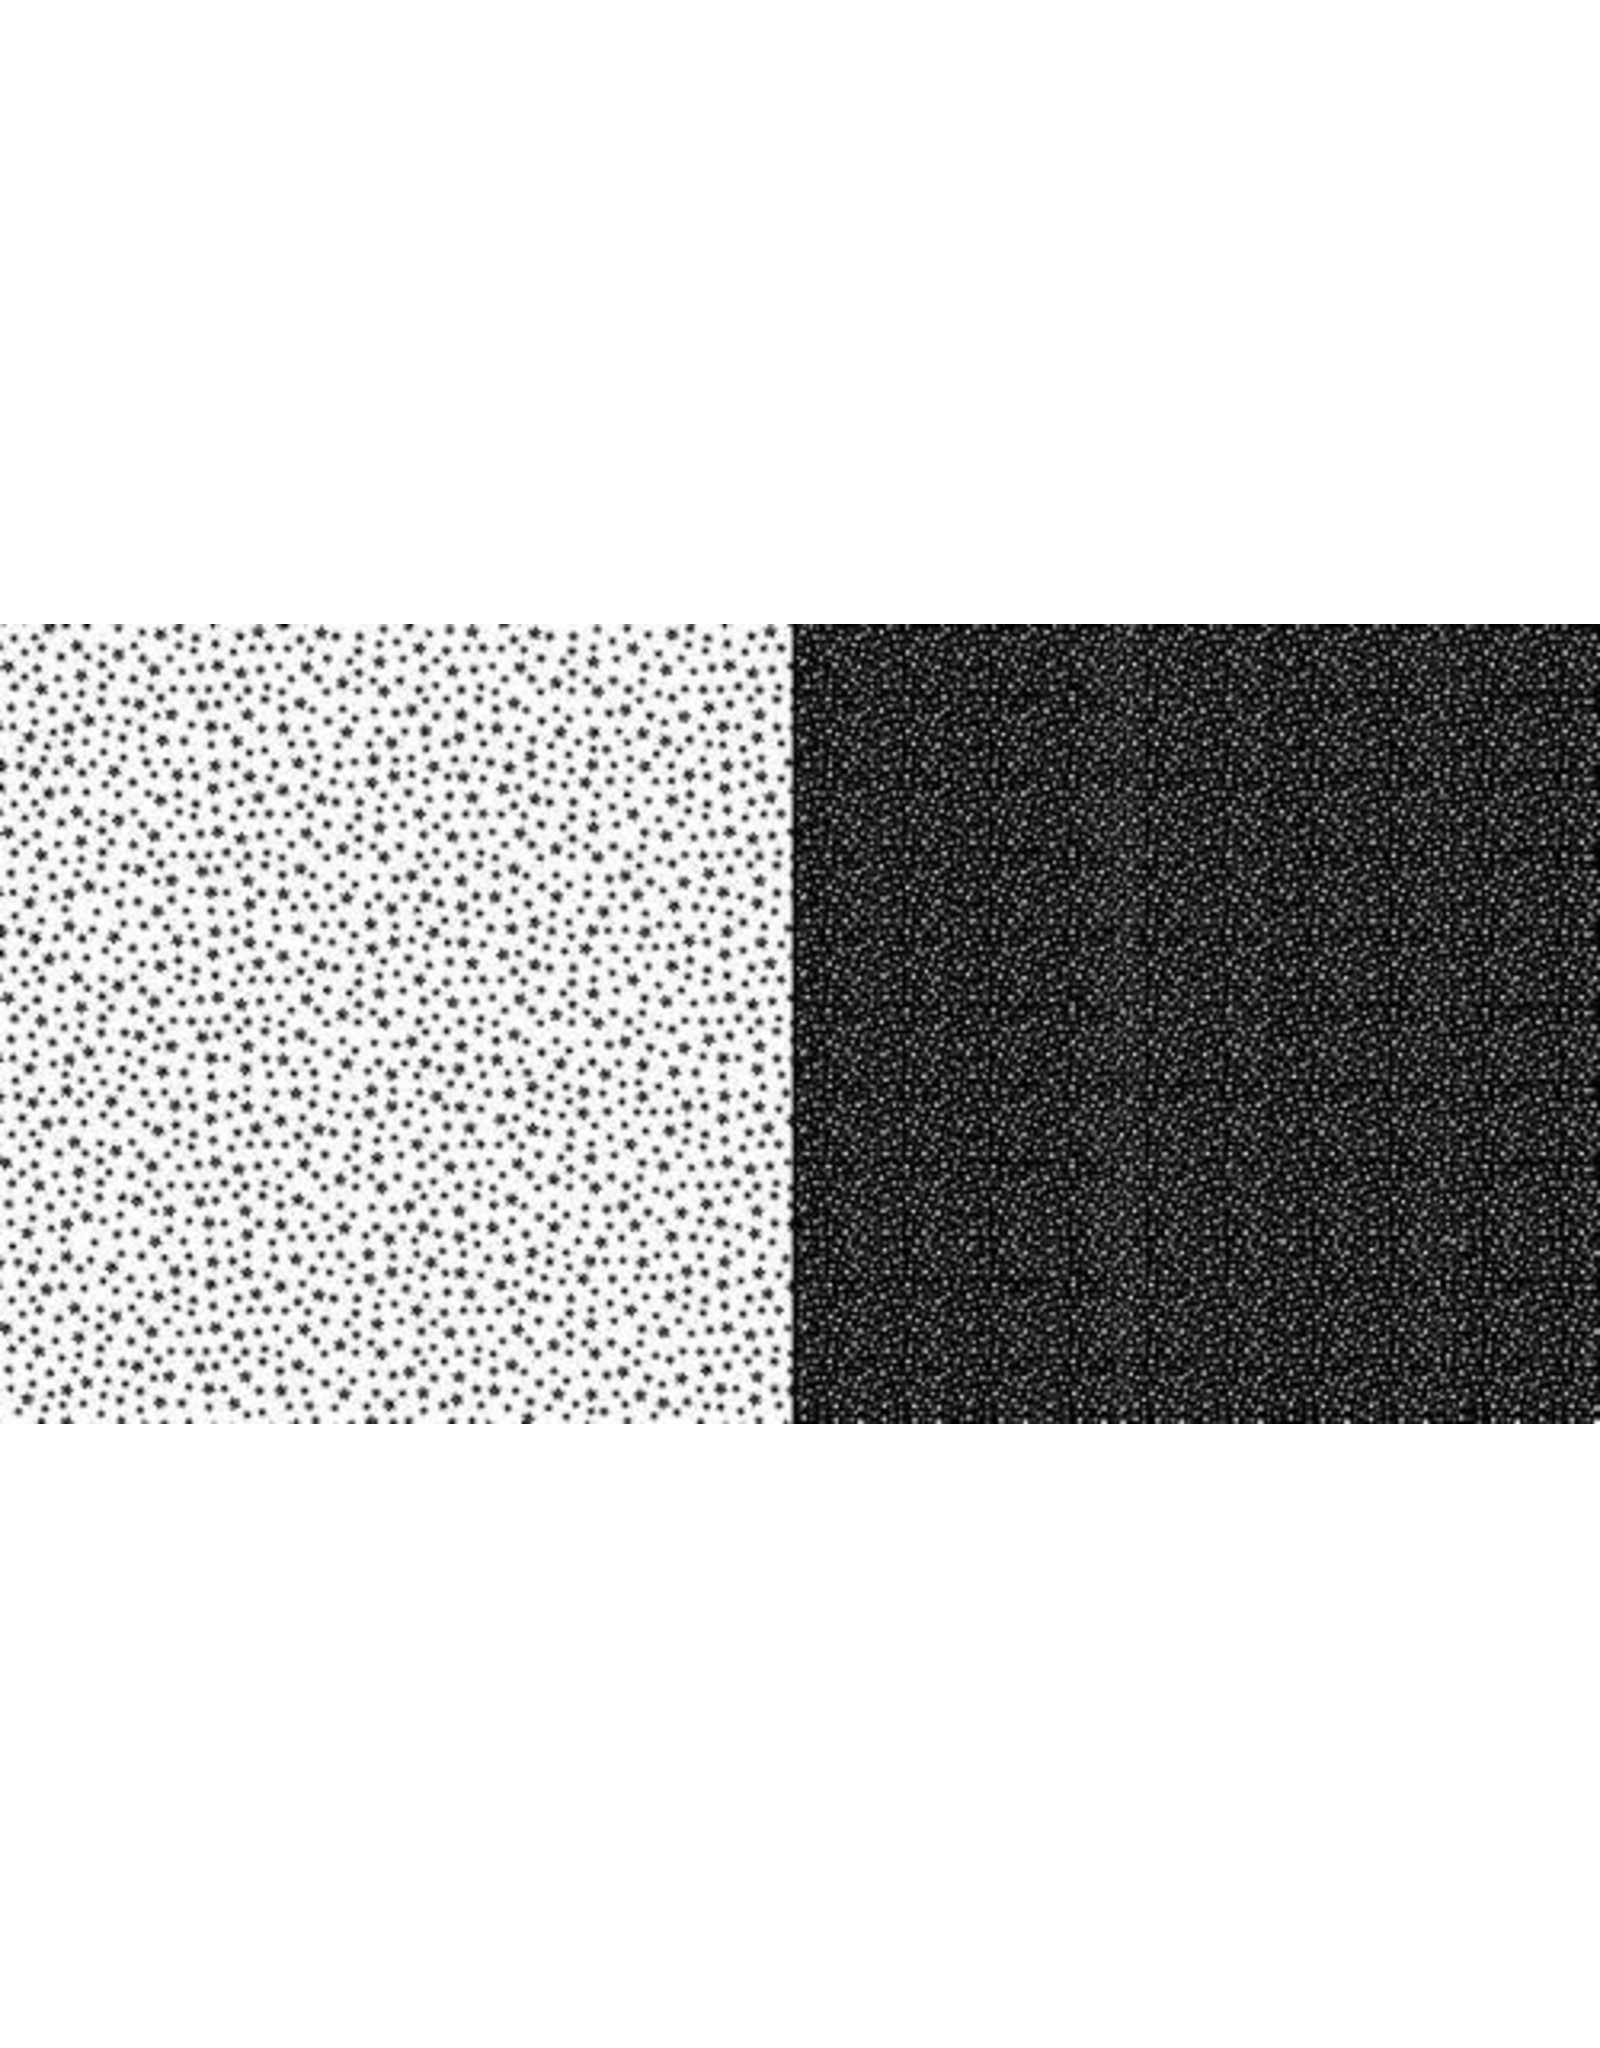 Dini Design Dini Design Scrappapier 10 vl Stippen bloemen - Middernacht 30,5x30,5cm #2010